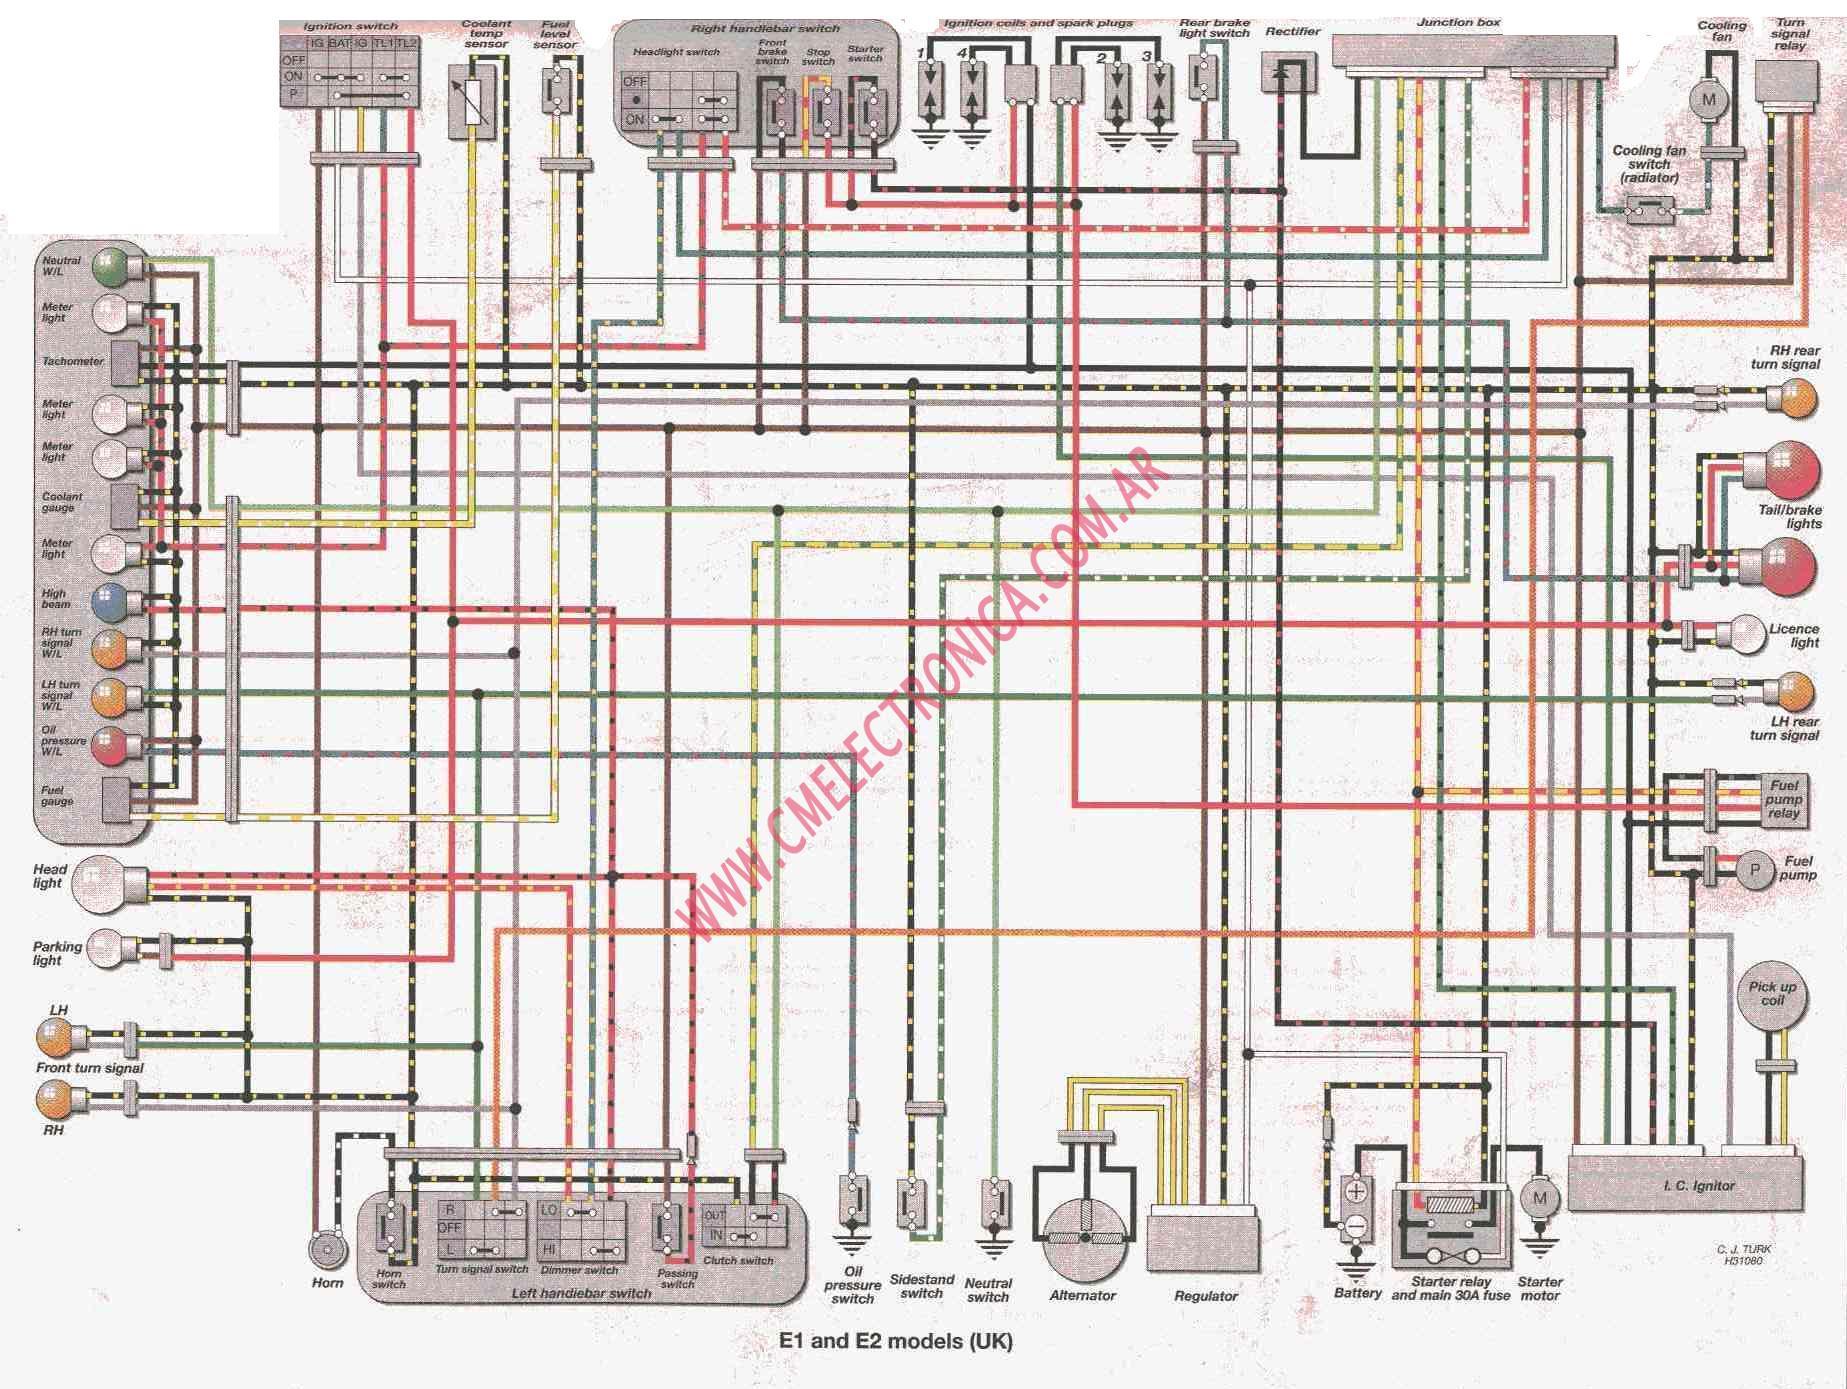 Yamaha R6 Wiring Diagram 93 Schematic Fz8 2000 Service Manual Pdf